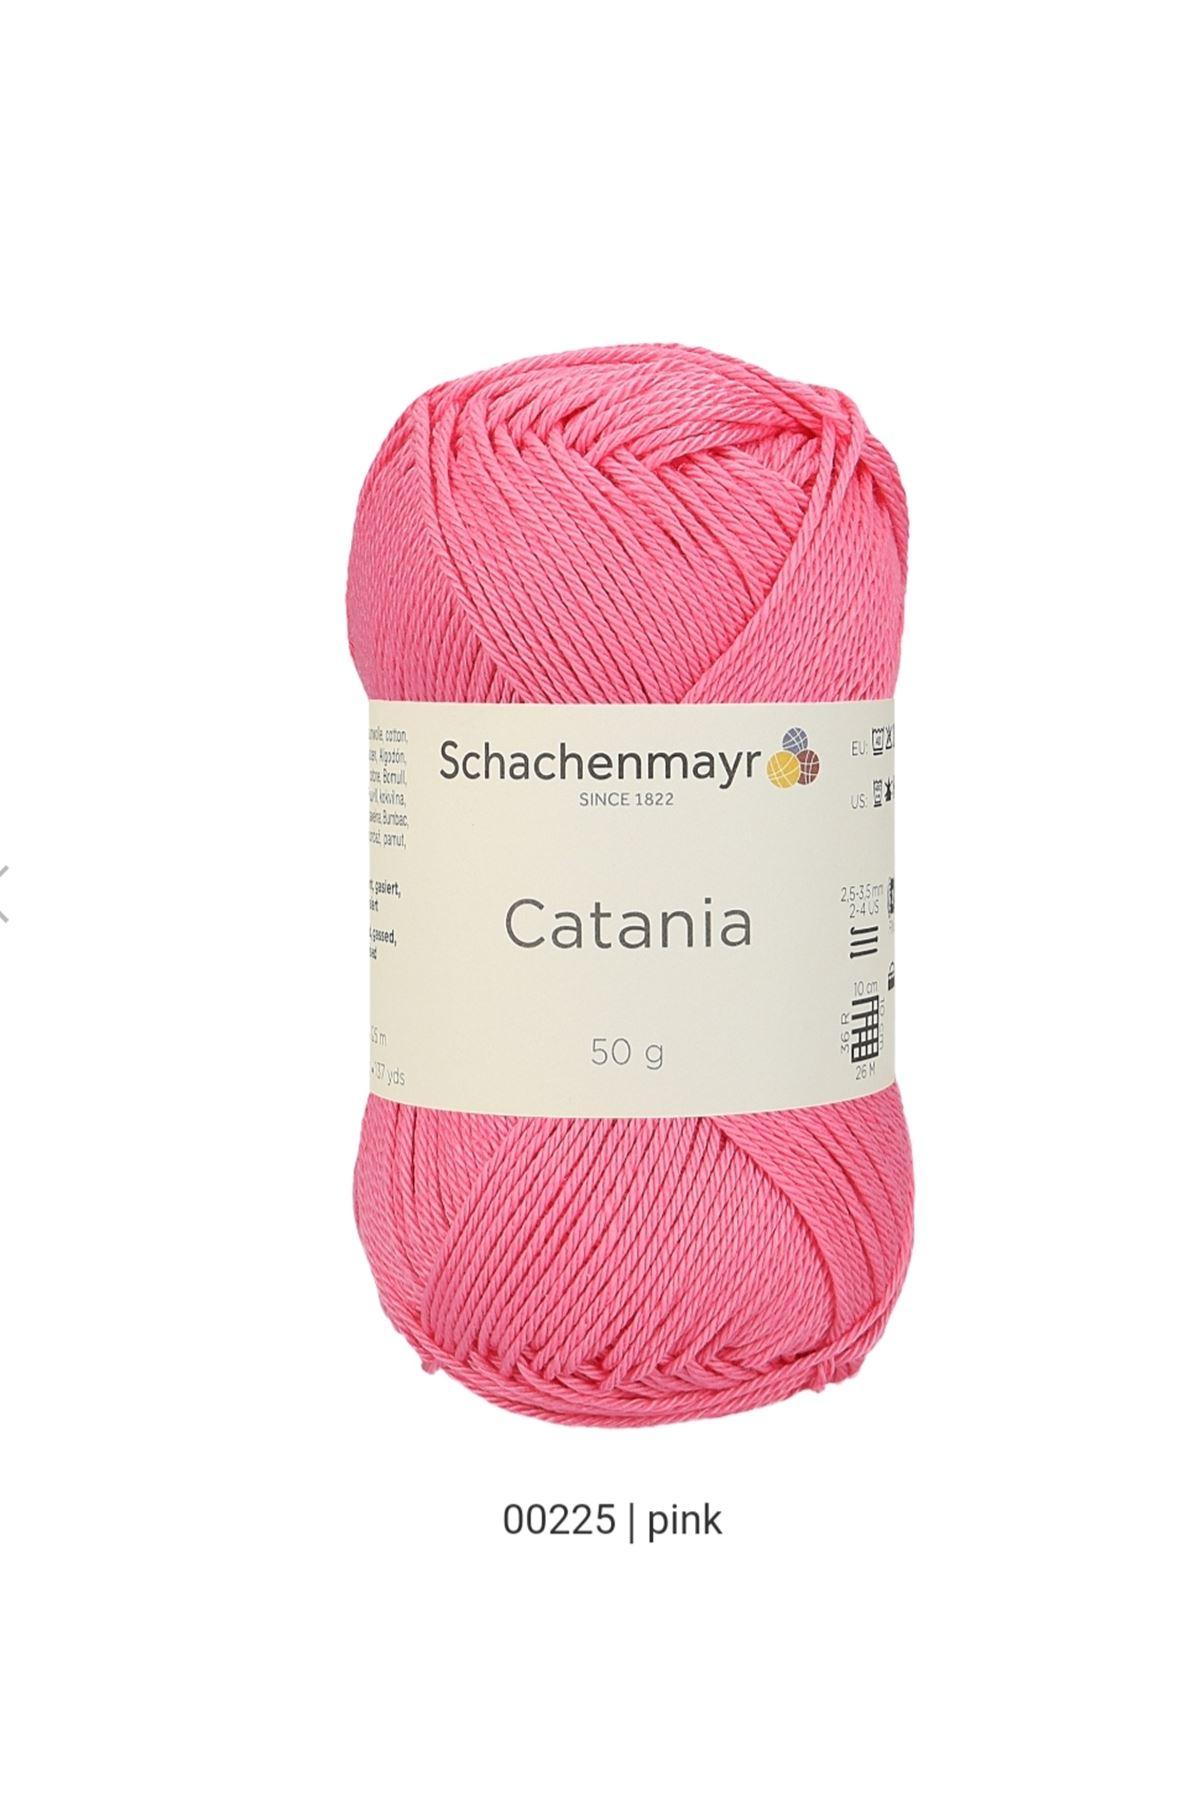 SMC Catania 50g 00225 Pink Pembe